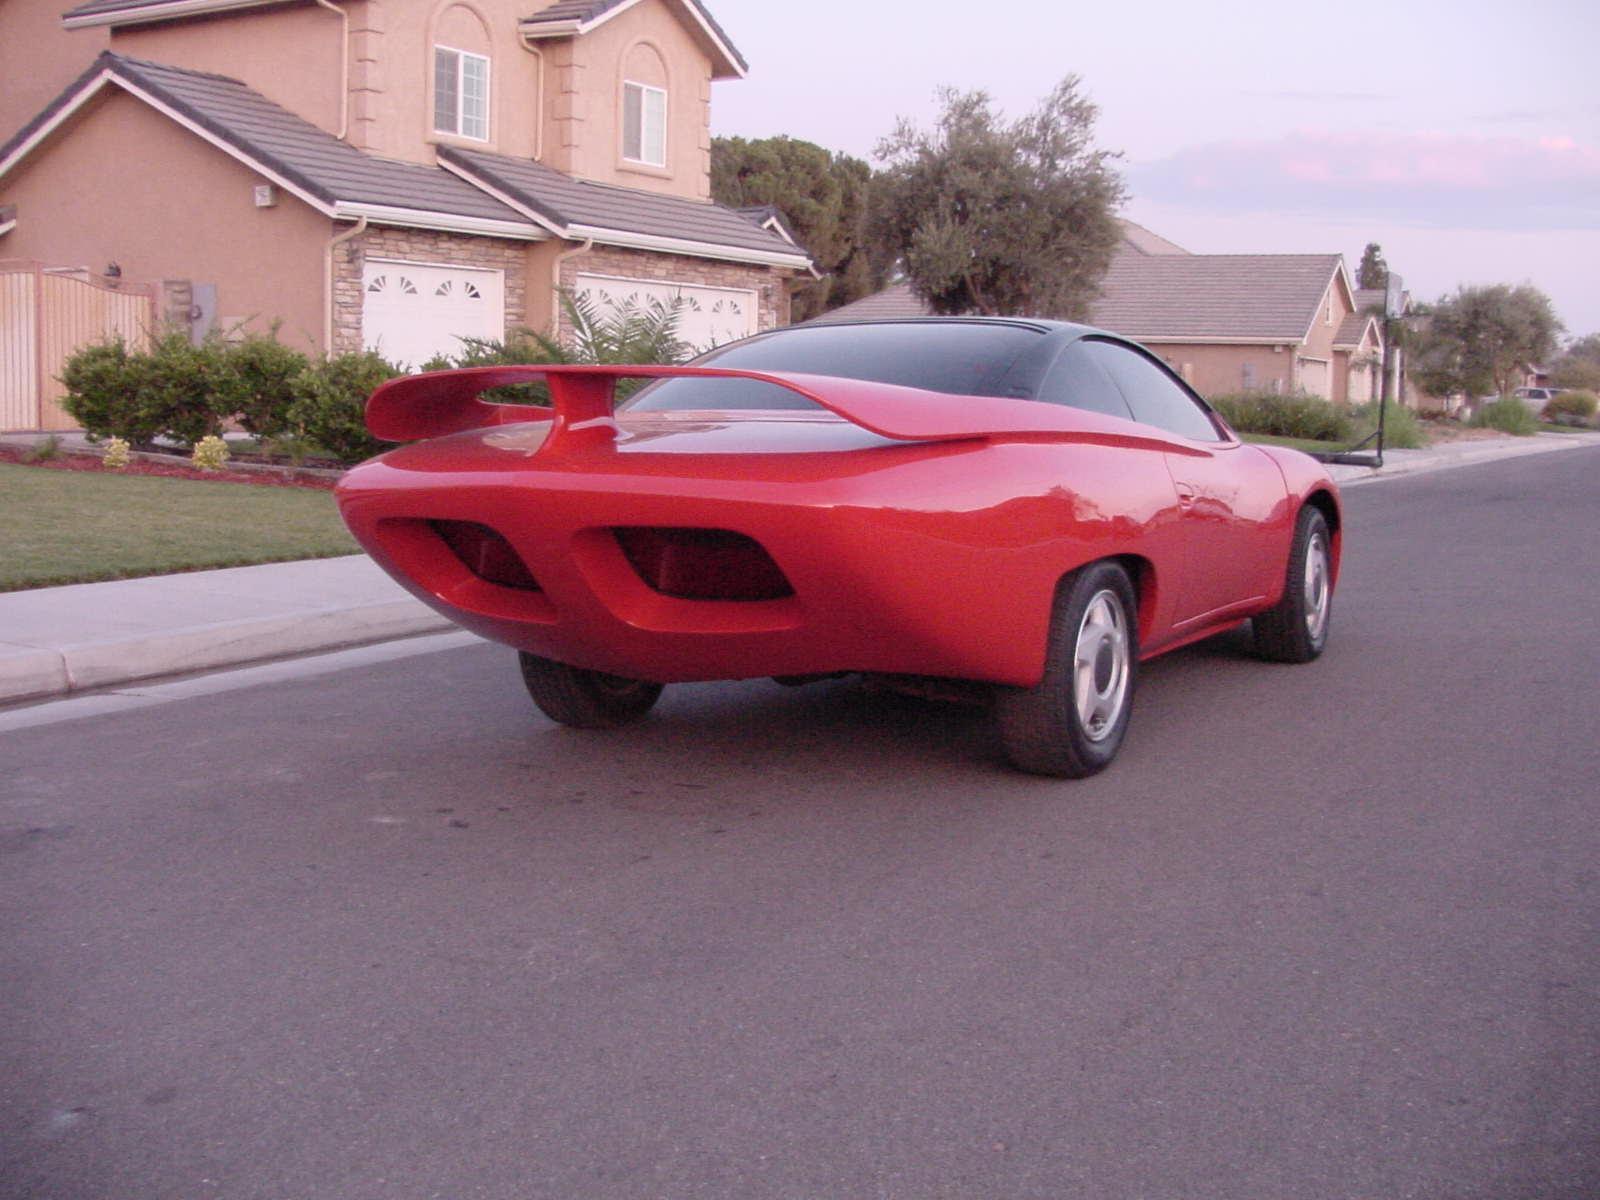 car sale for com otoriyoce stealth illinois dodge t grove near turbo sugar american amazing rt r